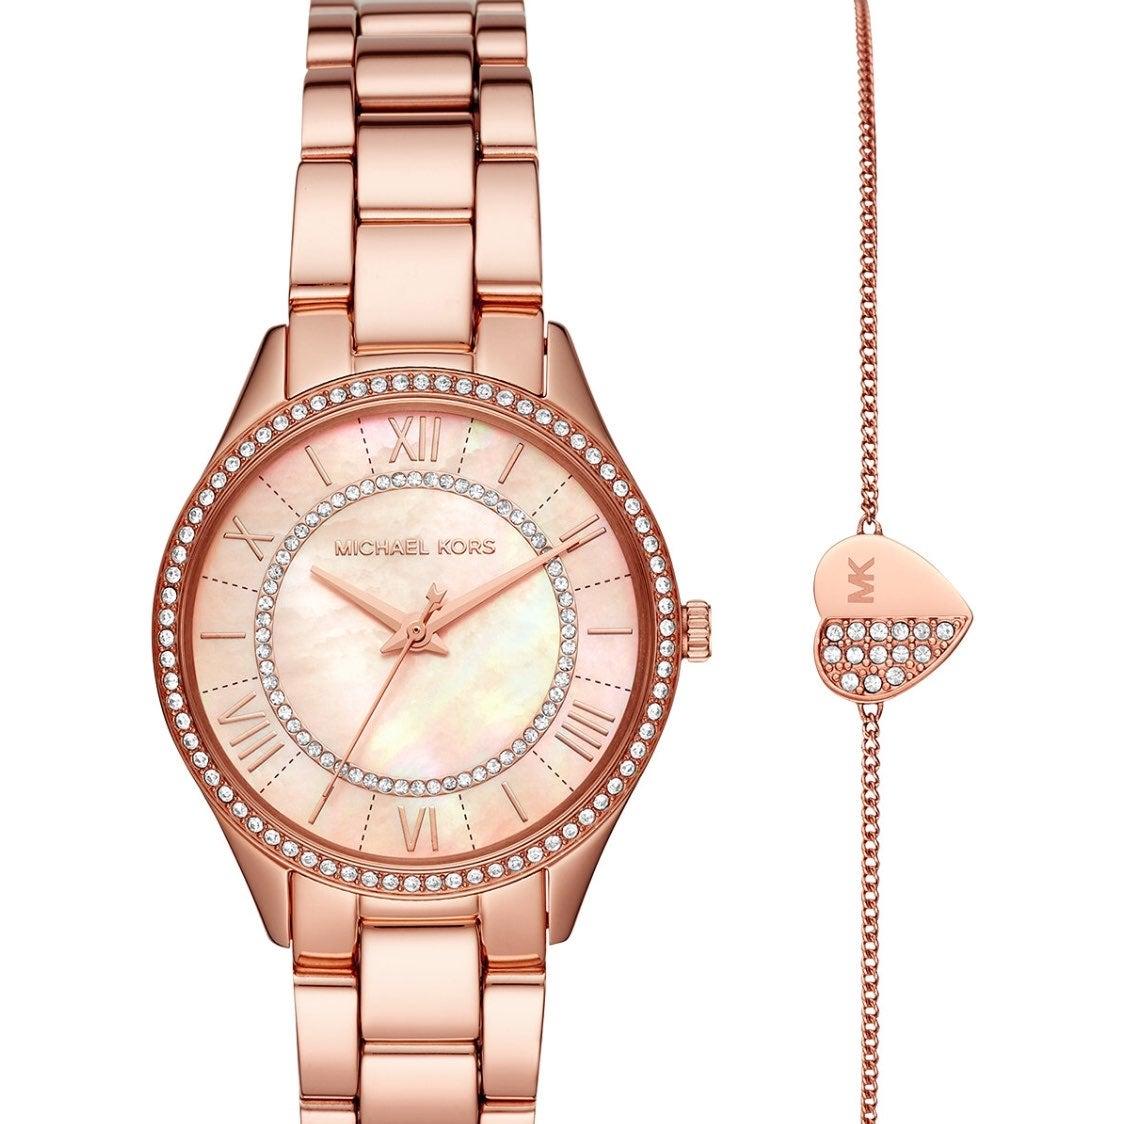 NIB Michael Kors Watch & Heart Bracelet